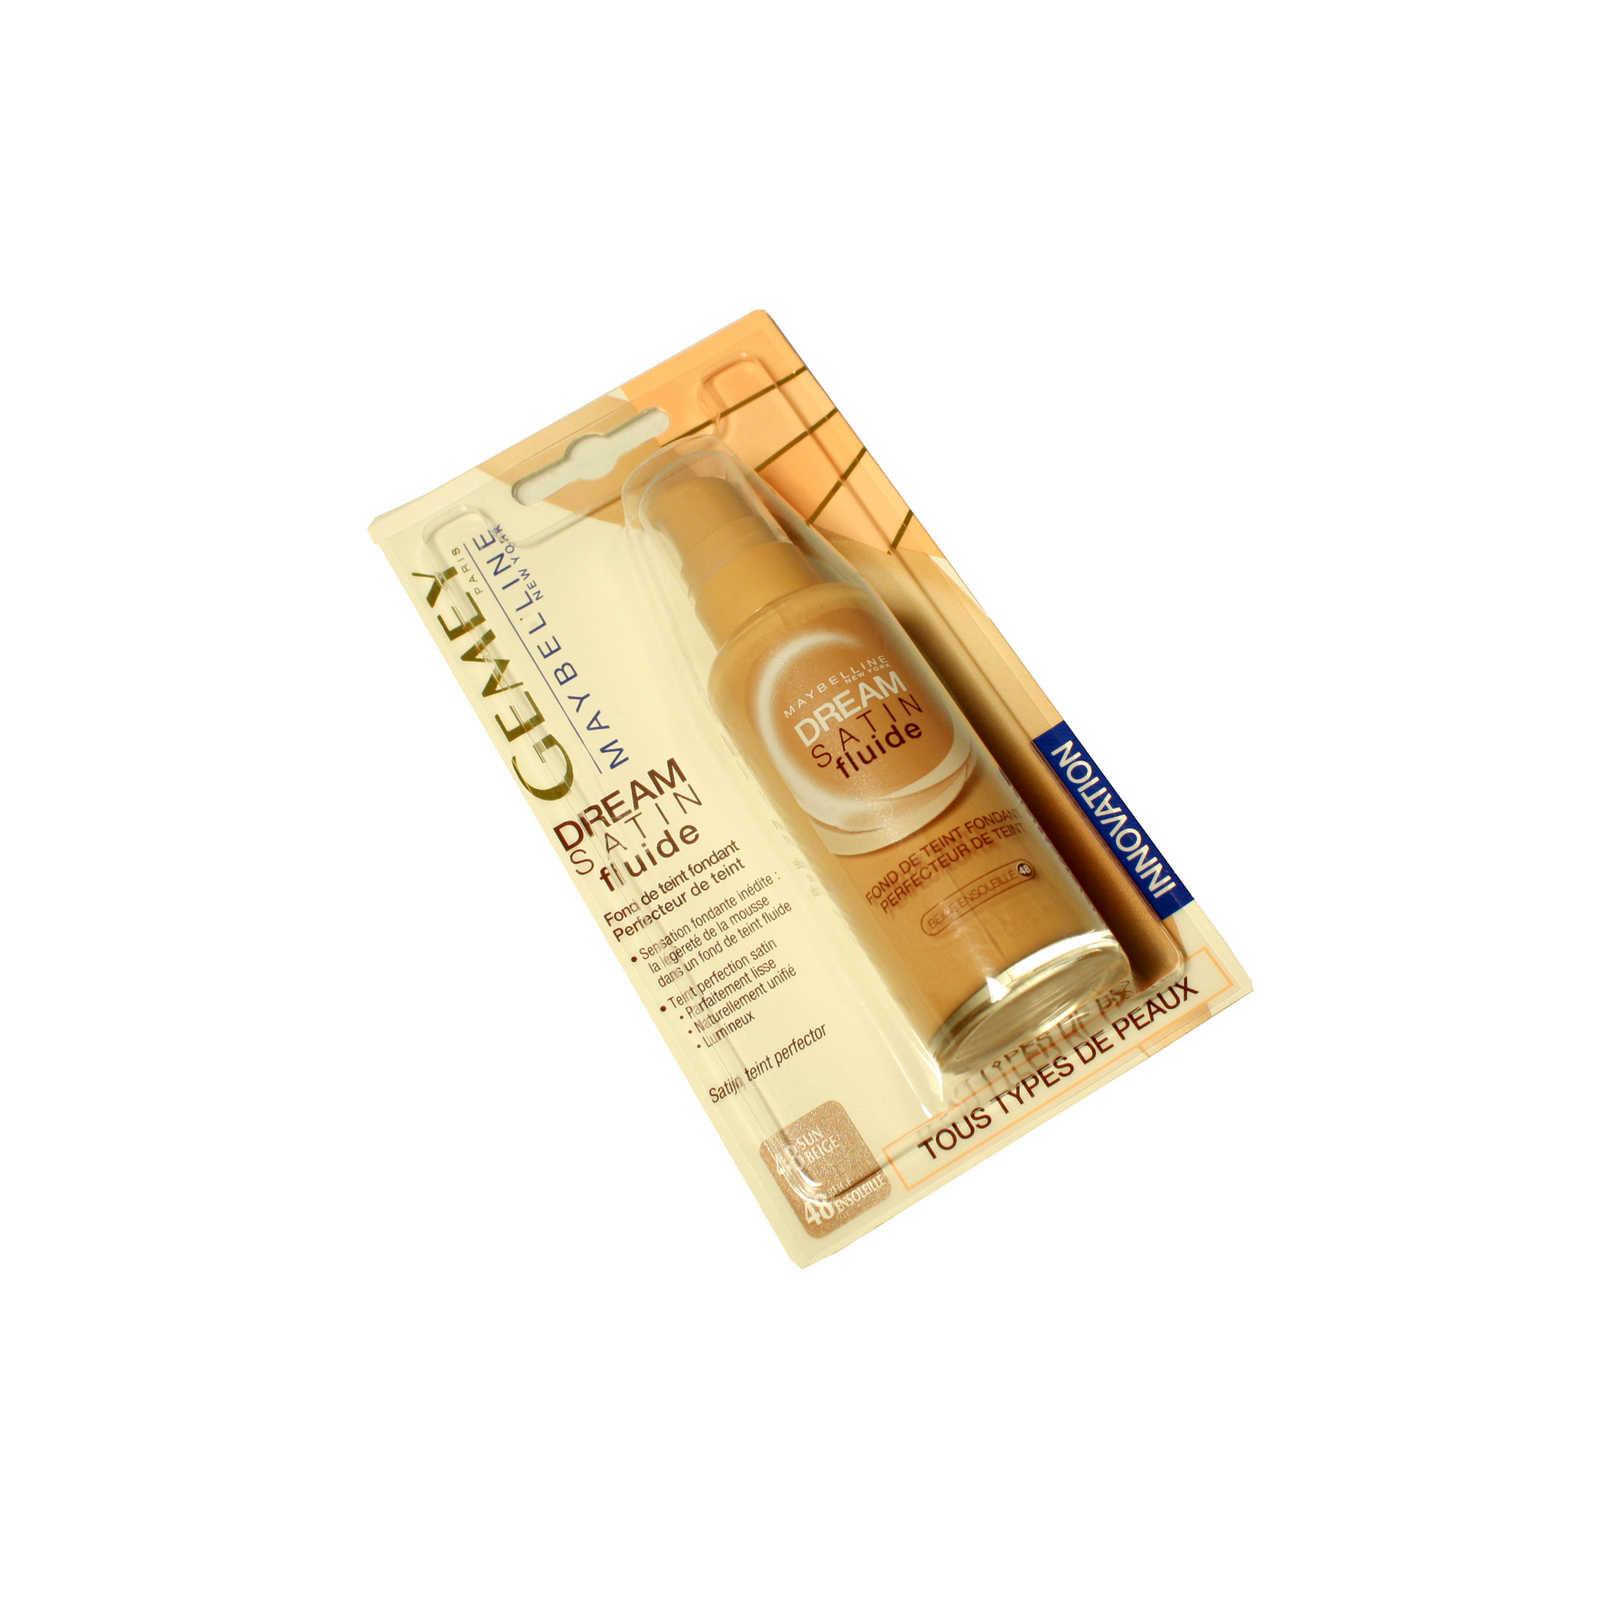 Gemey Maybelline Foundation Dream satin Fluide 48 Sun beige   delhaize.be 7de571f5d38